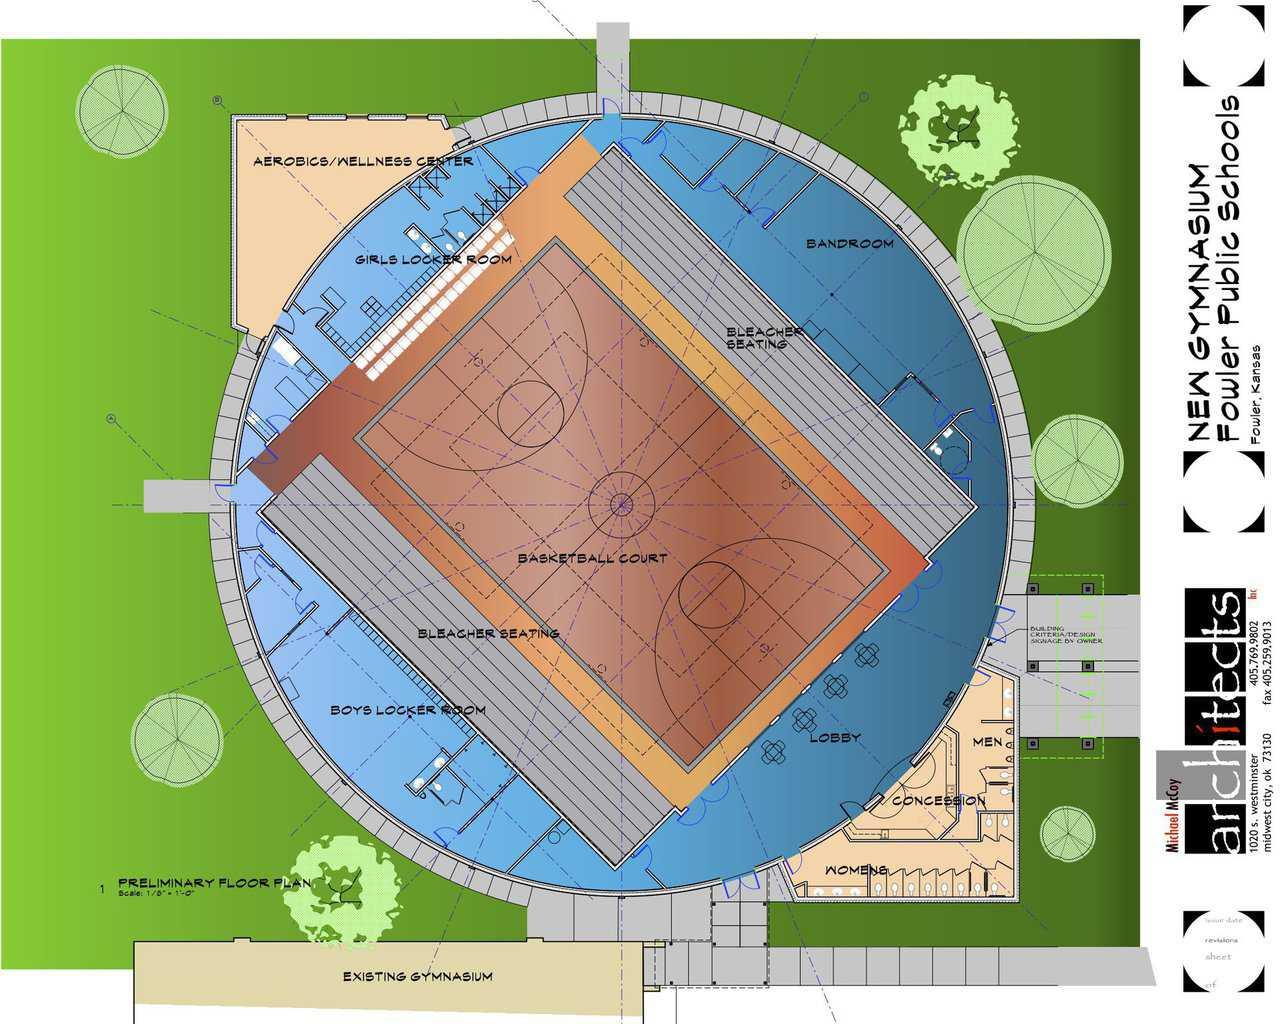 Best Kitchen Gallery: Big Open House At Fowler Usd 225 Monolithic Dome Institute of Sport Gym Floor Plan on rachelxblog.com